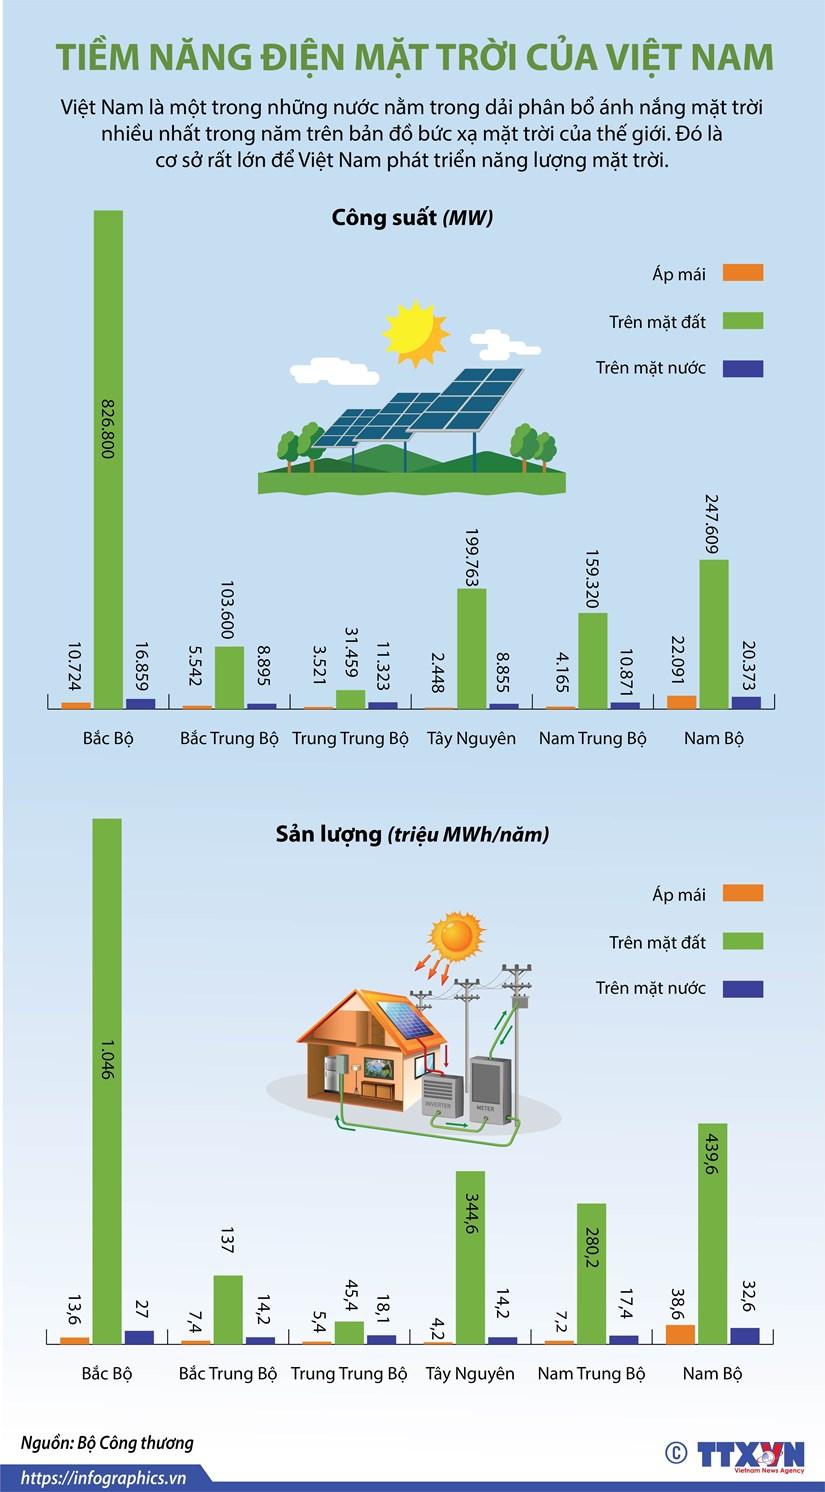 [Infographics] Tiem nang trong linh vuc dien Mat Troi cua Viet Nam hinh anh 1